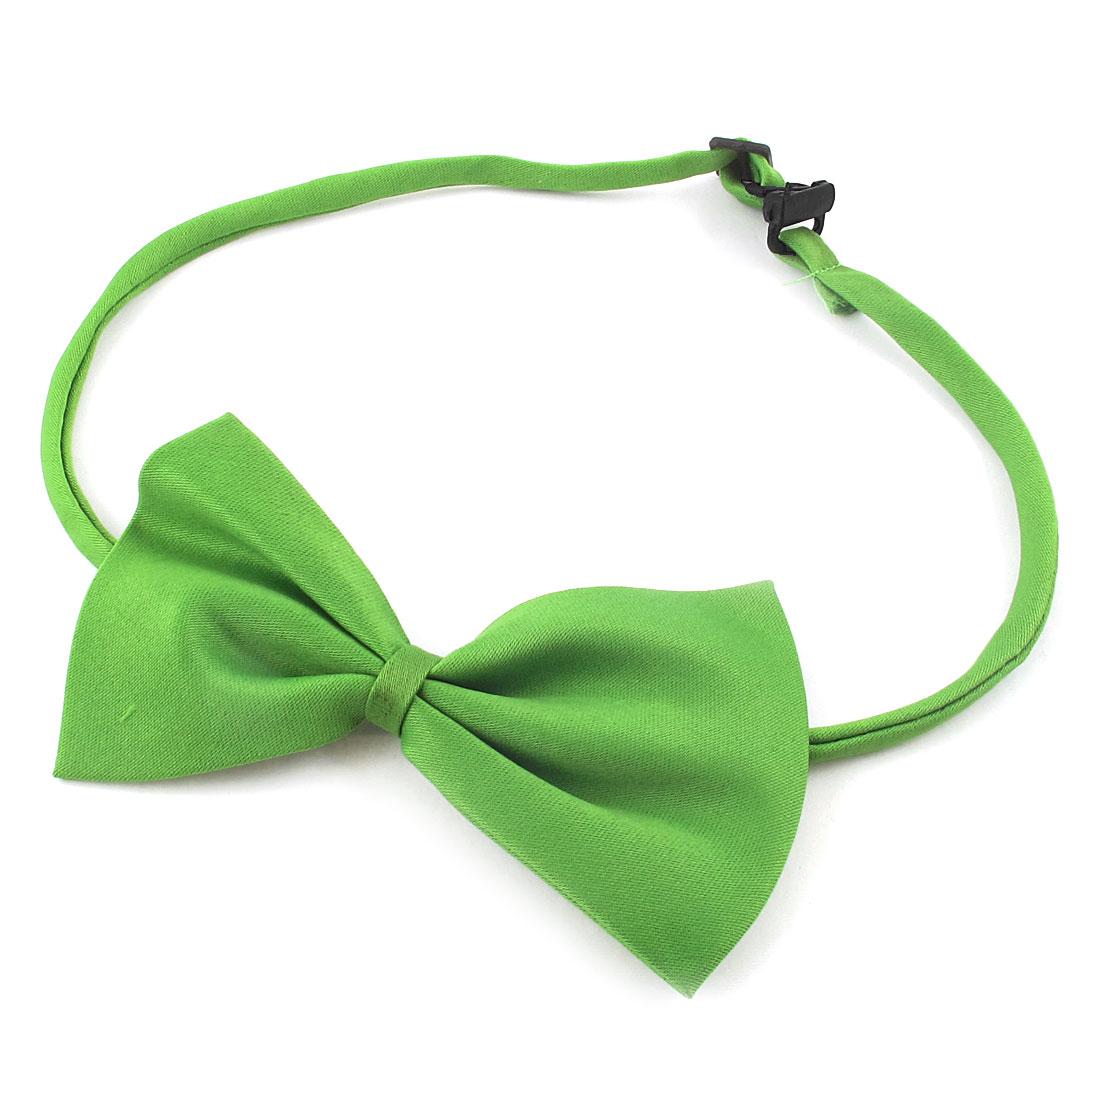 2pcs Adjustable Band Pet Dog Doggy Bowtie Necktie Collar Green